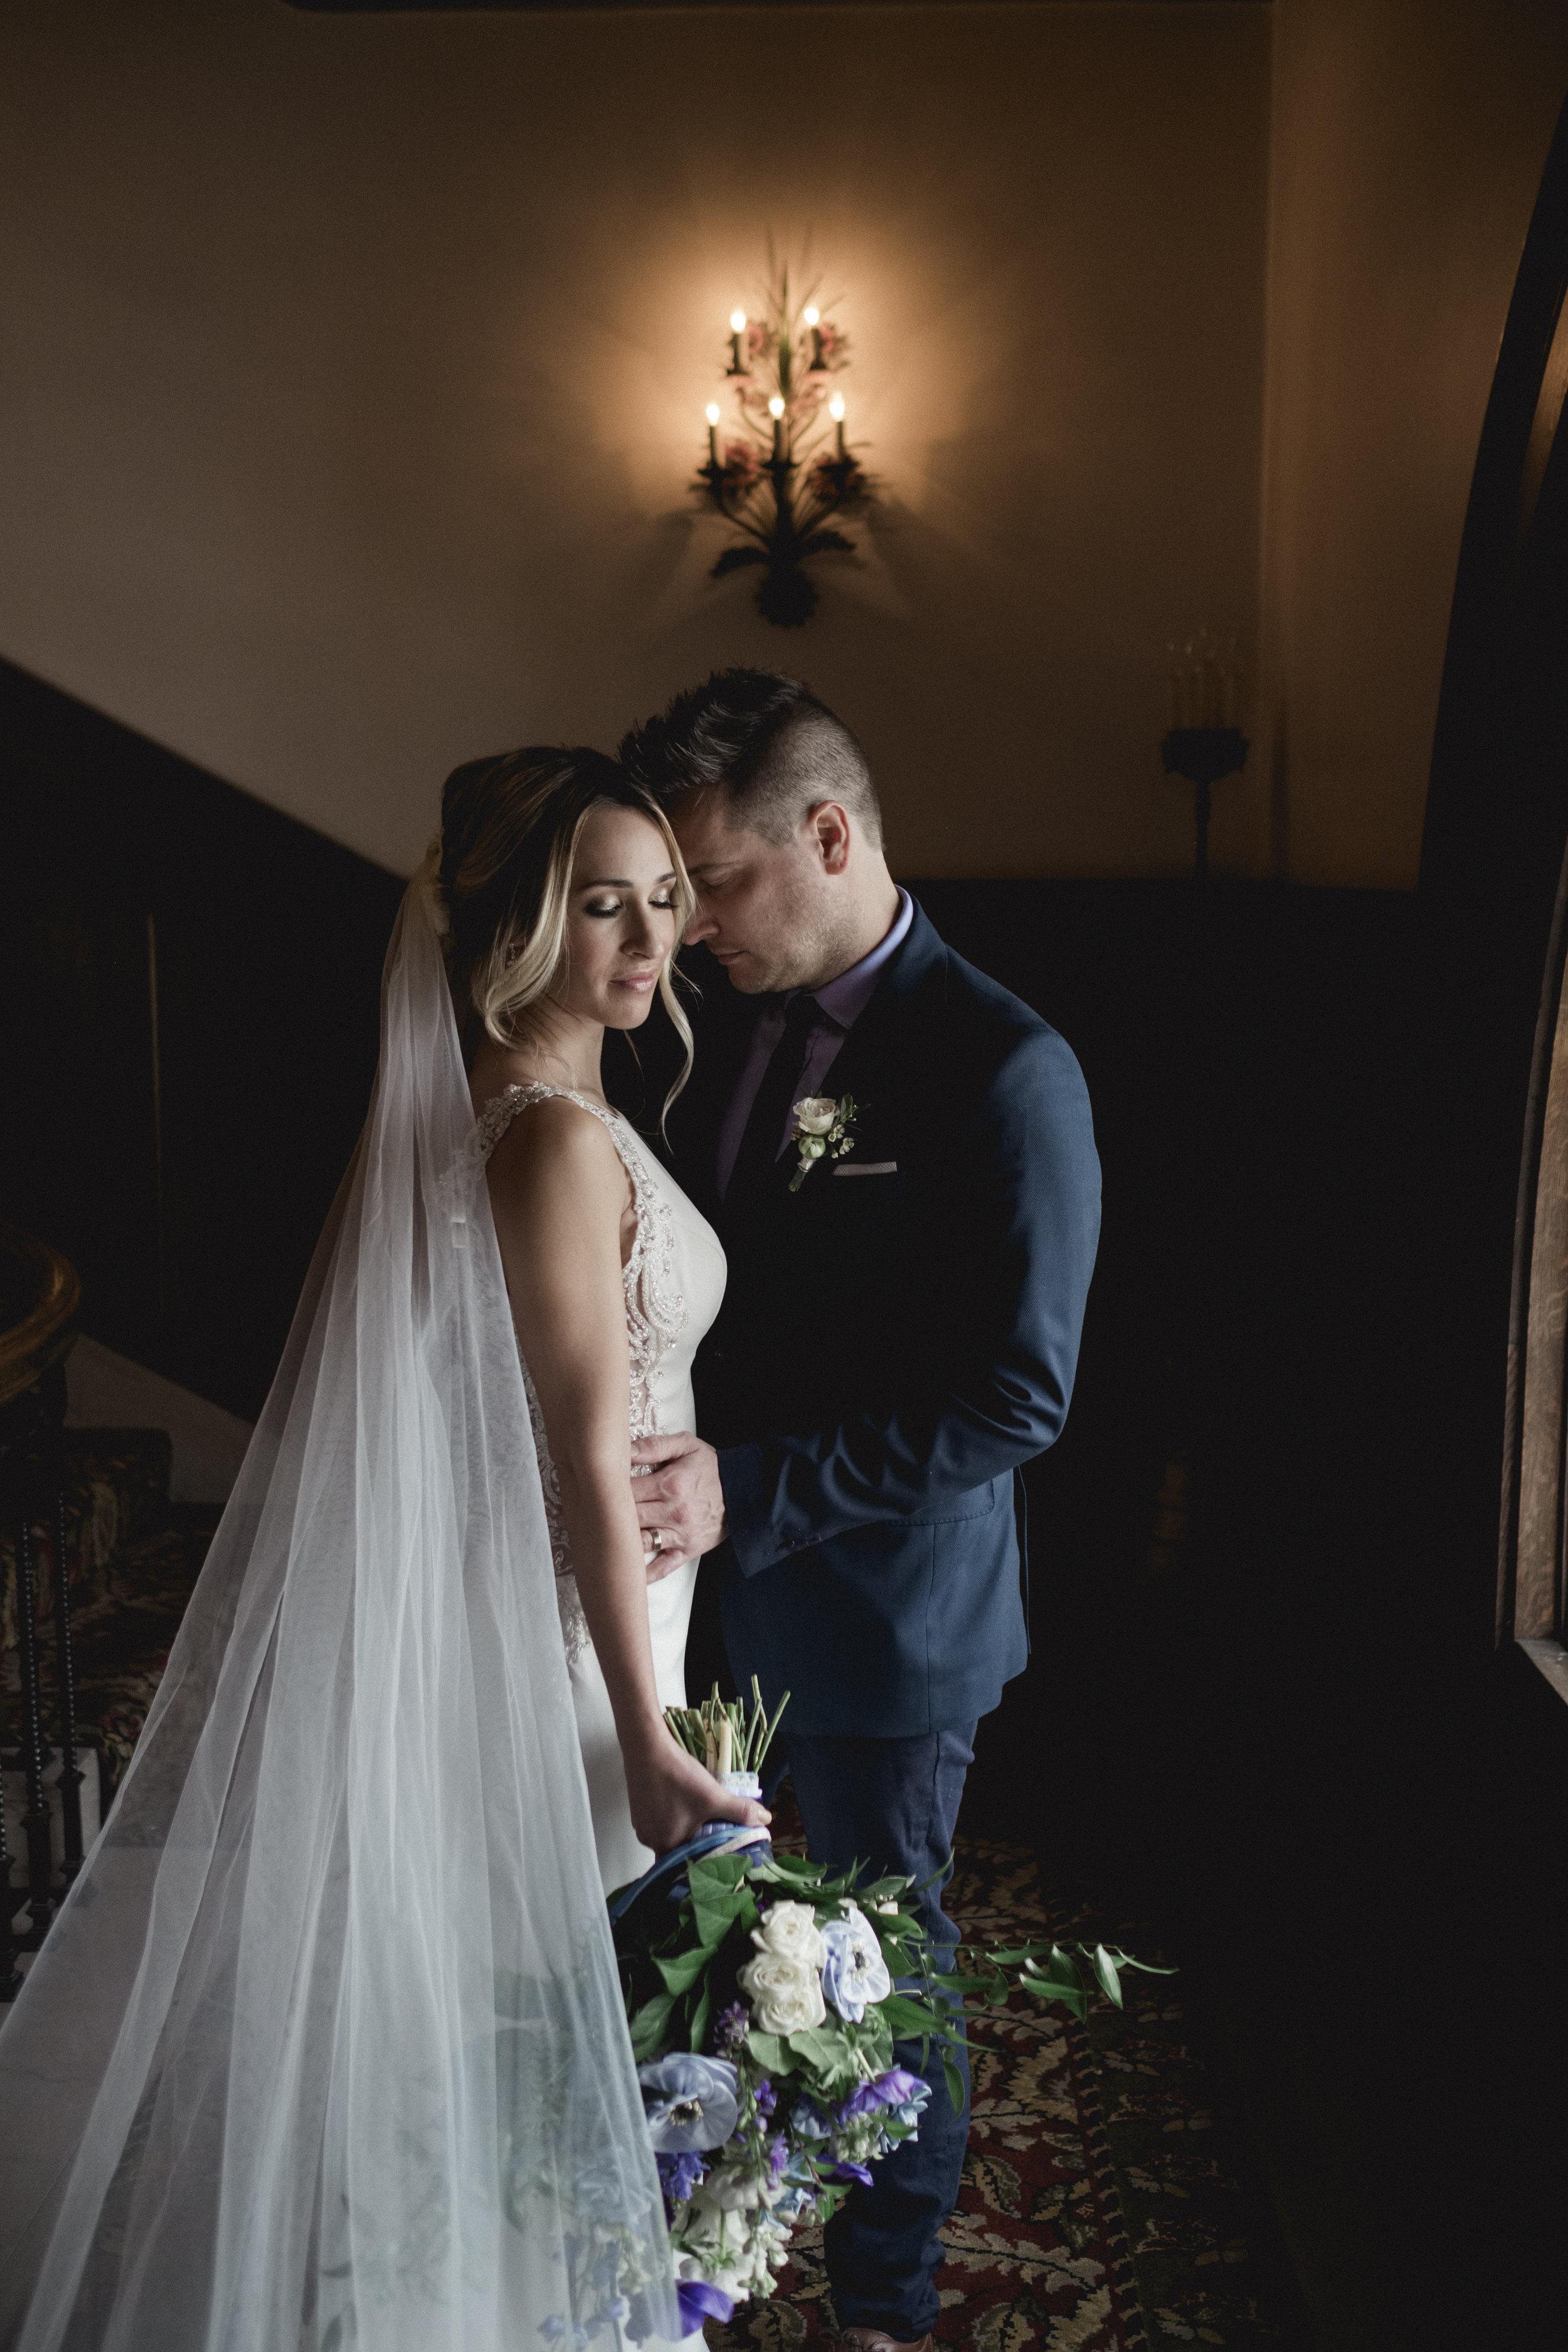 Toledo Wedding Photographers at the Toledo Club for Styled Shoot